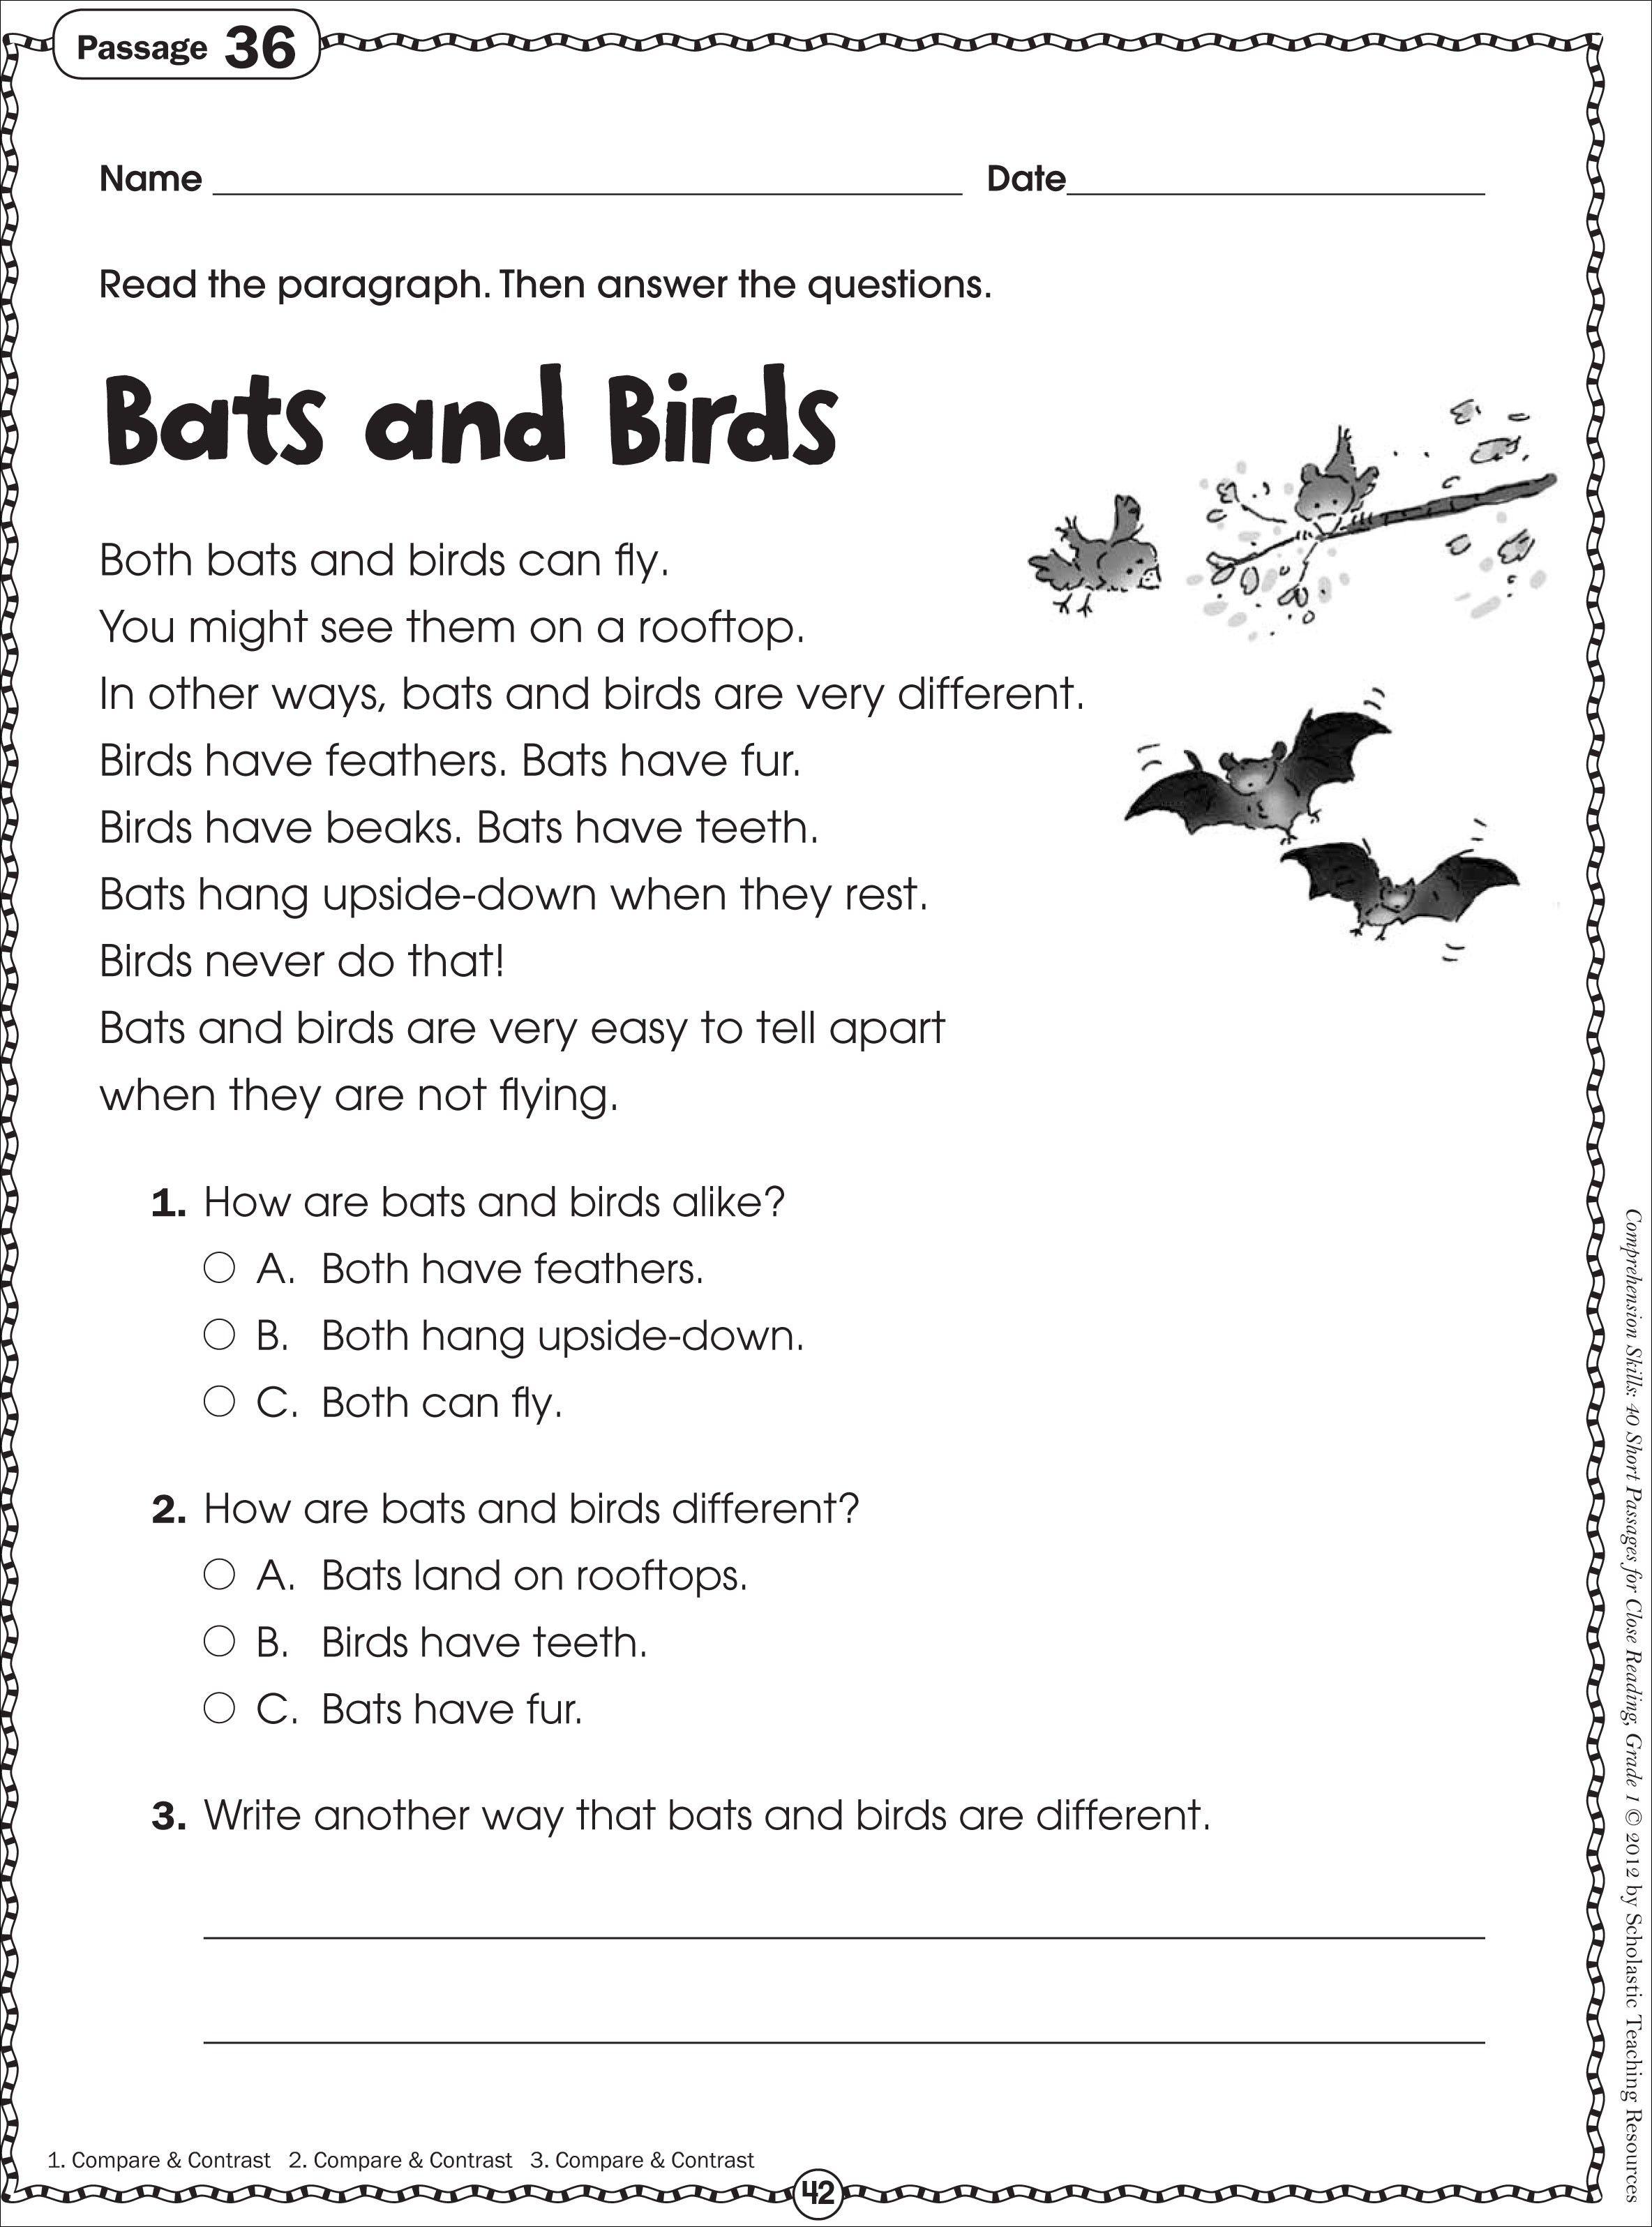 Free Printable Reading Comprehension Worksheets For Kindergarten - Free Printable English Comprehension Worksheets For Grade 4